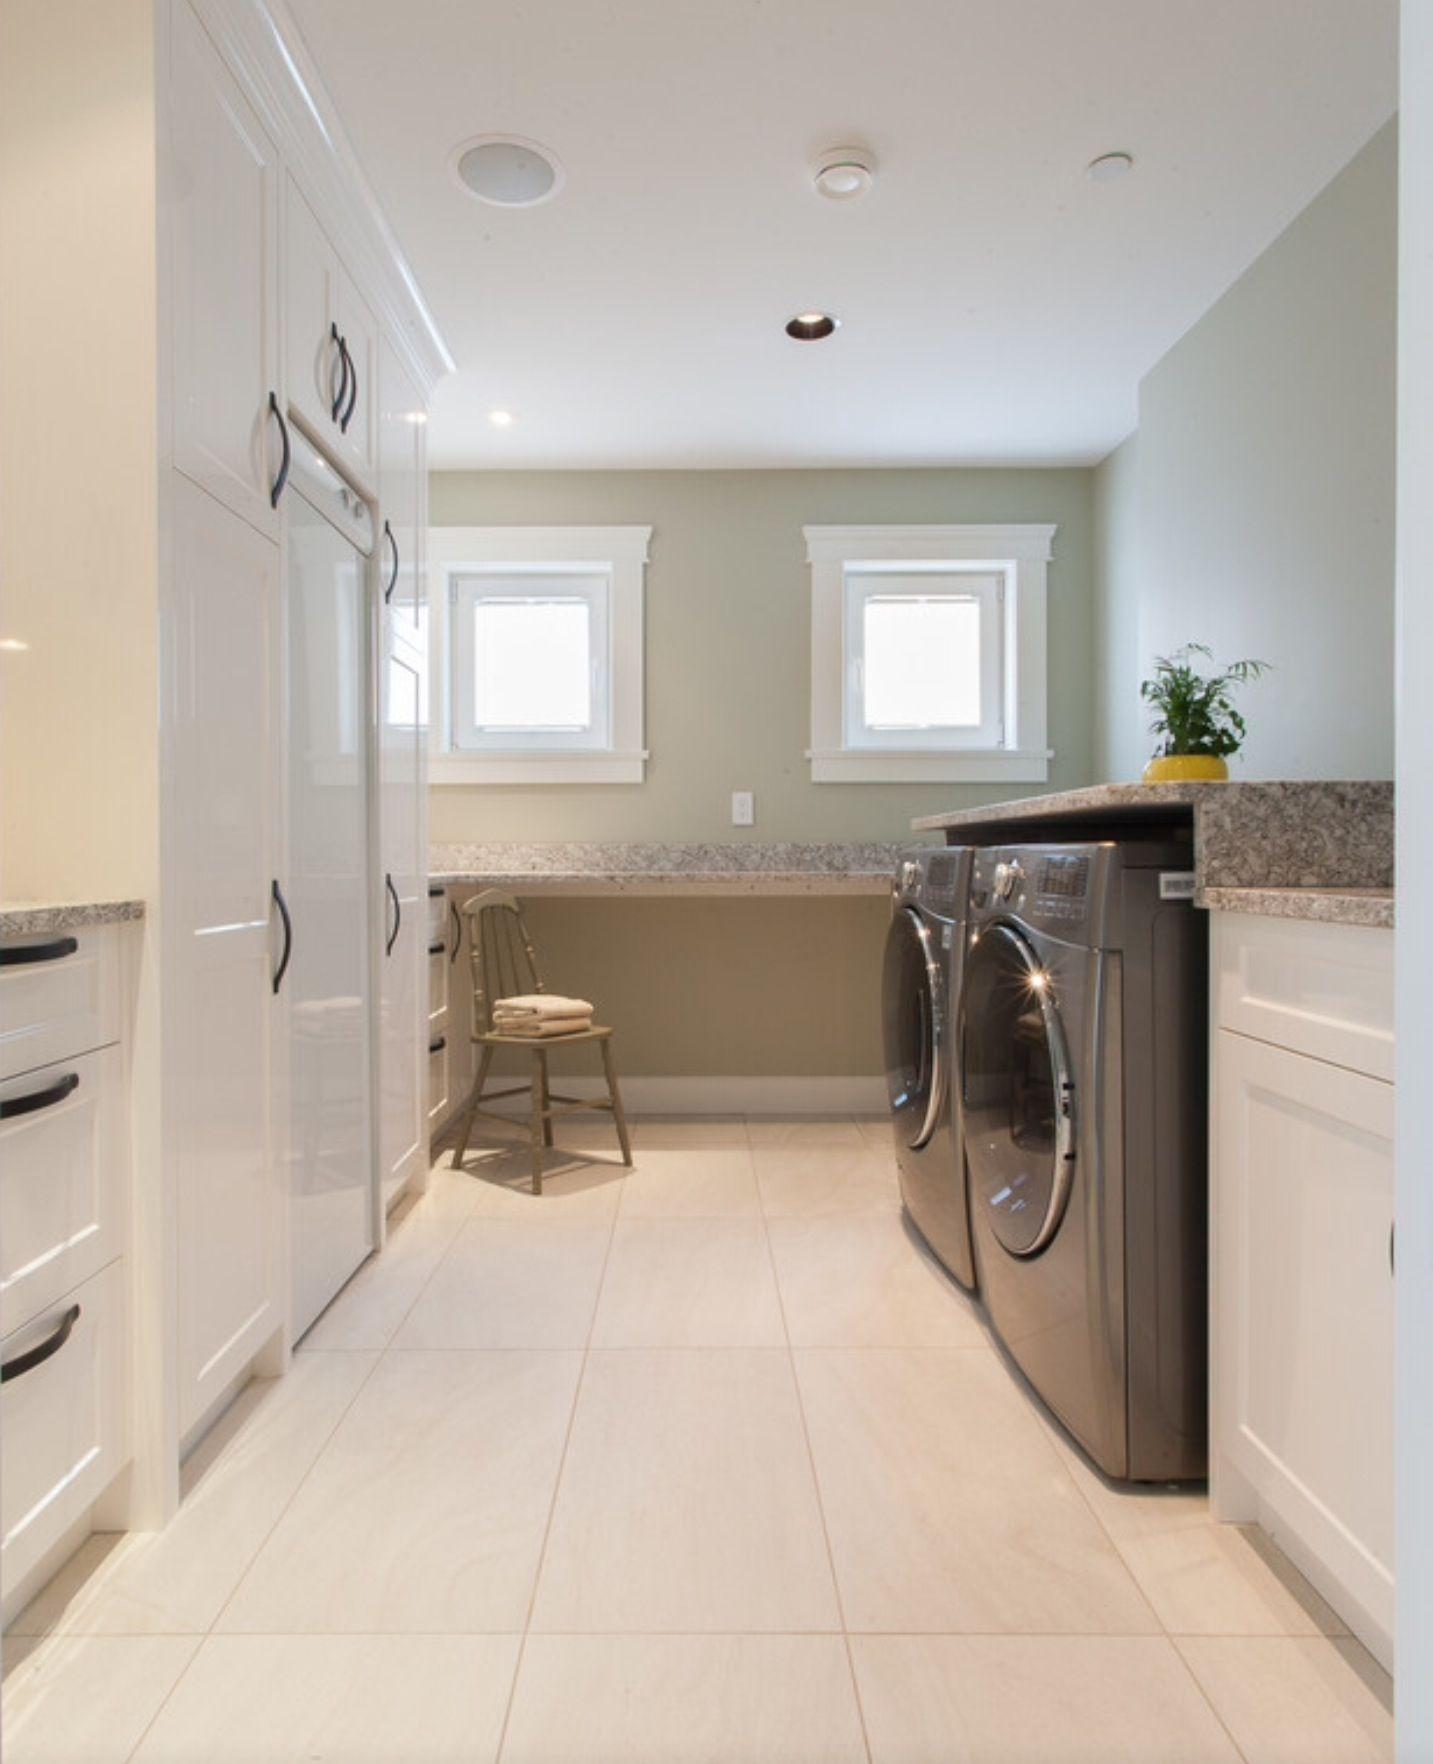 Oceanfront Craftsman Custom Home transitional laundry room vancouver Kenorah Construction & Design Ltd Benjamin Moore Spanish Olive